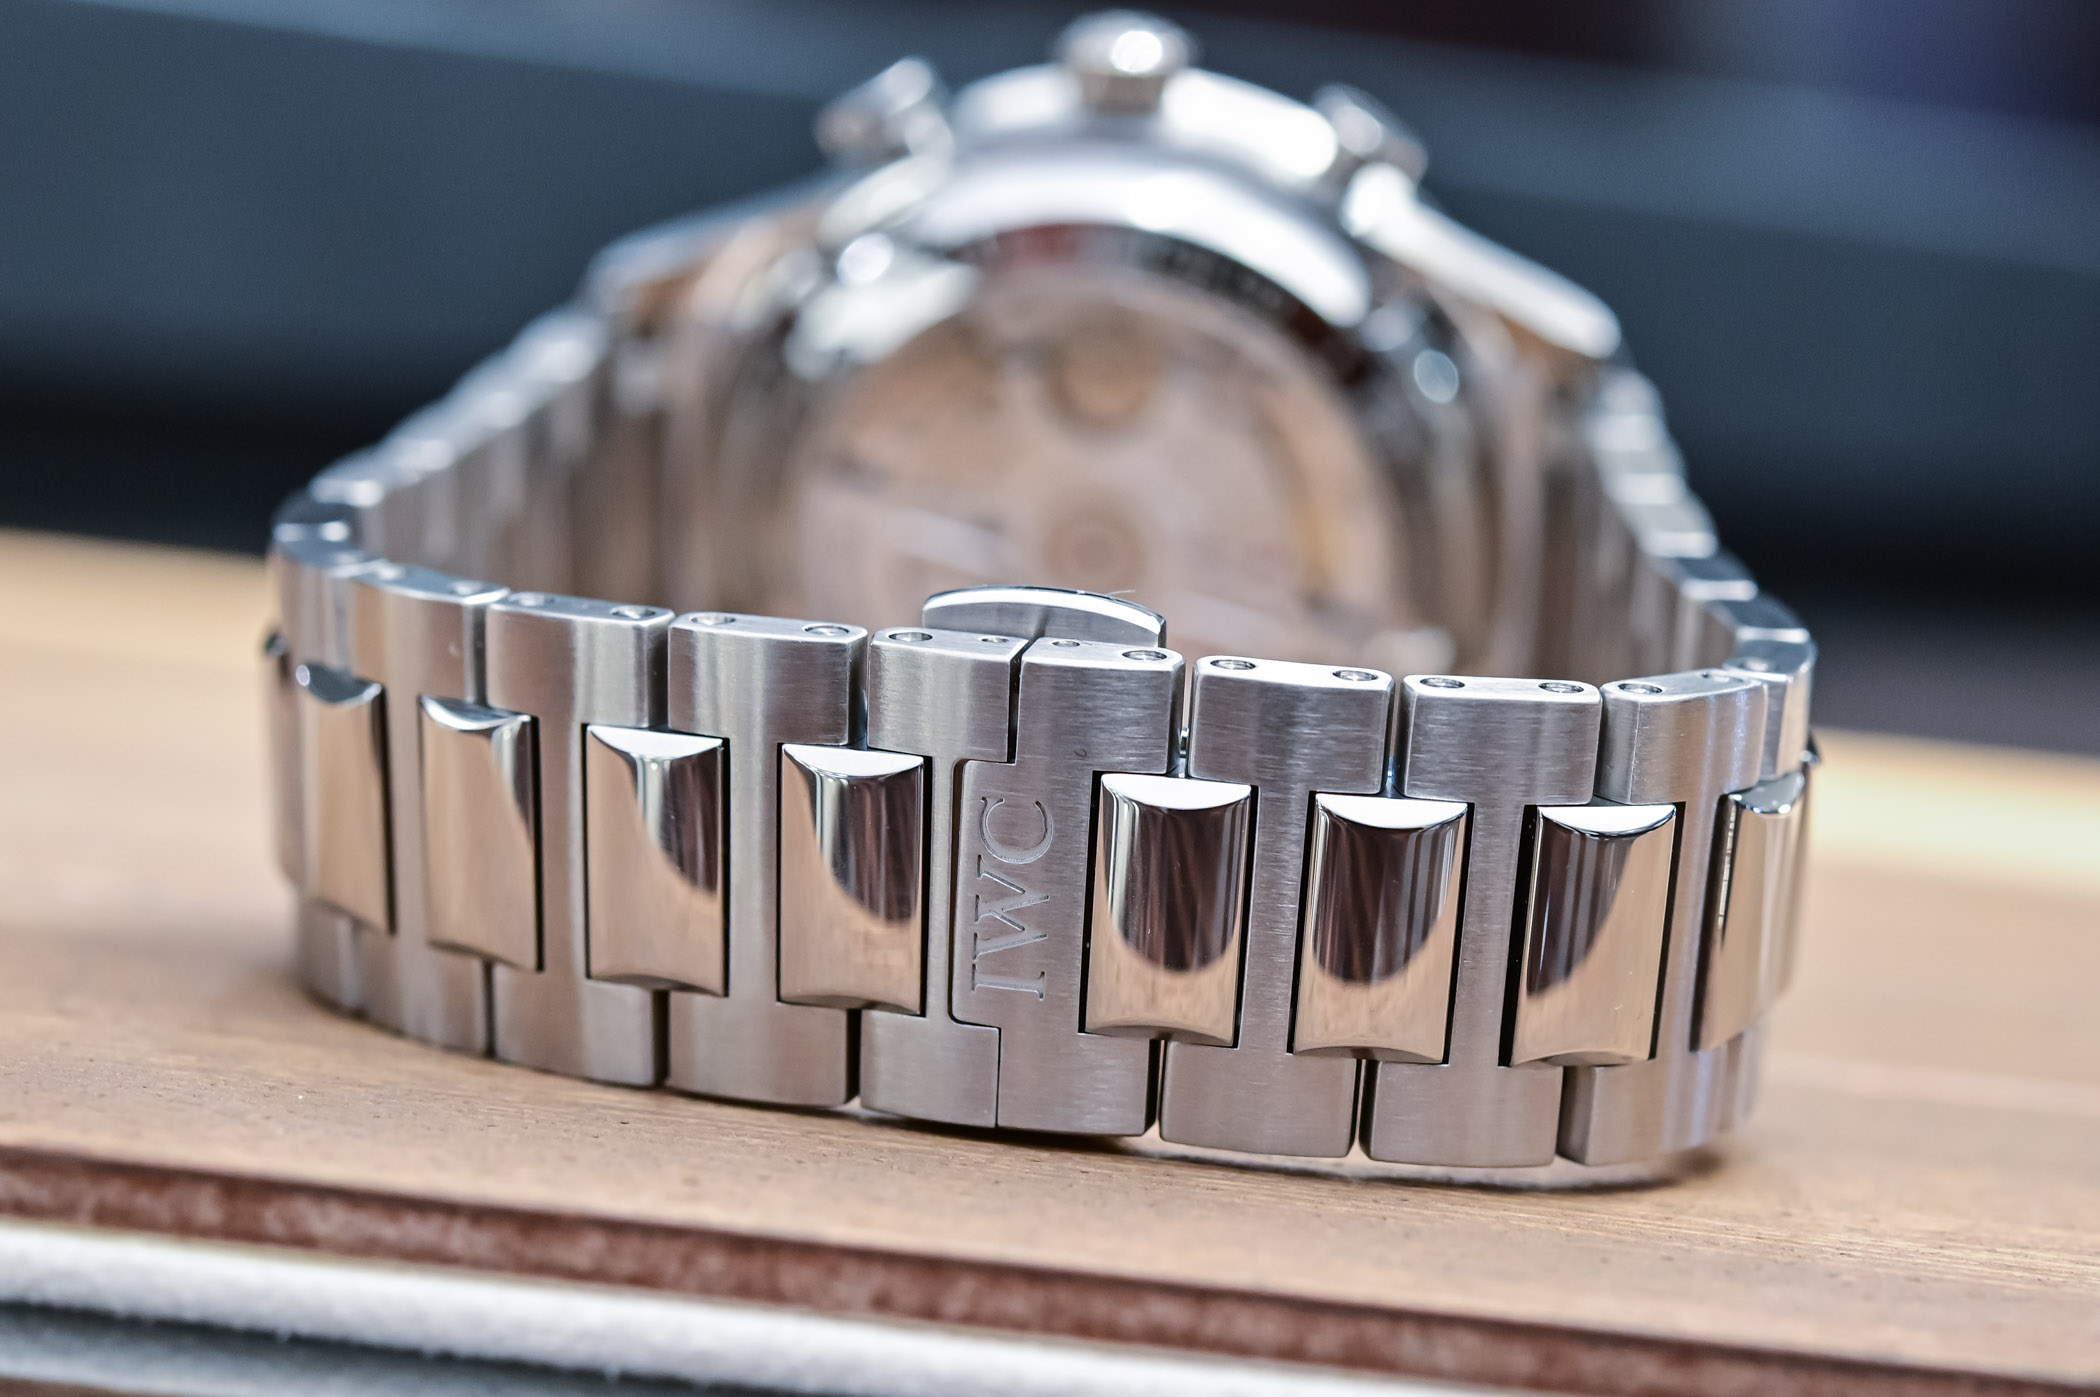 IWC Portugieser Chronograph 3716 Steel Bracelet IW371617 - 4